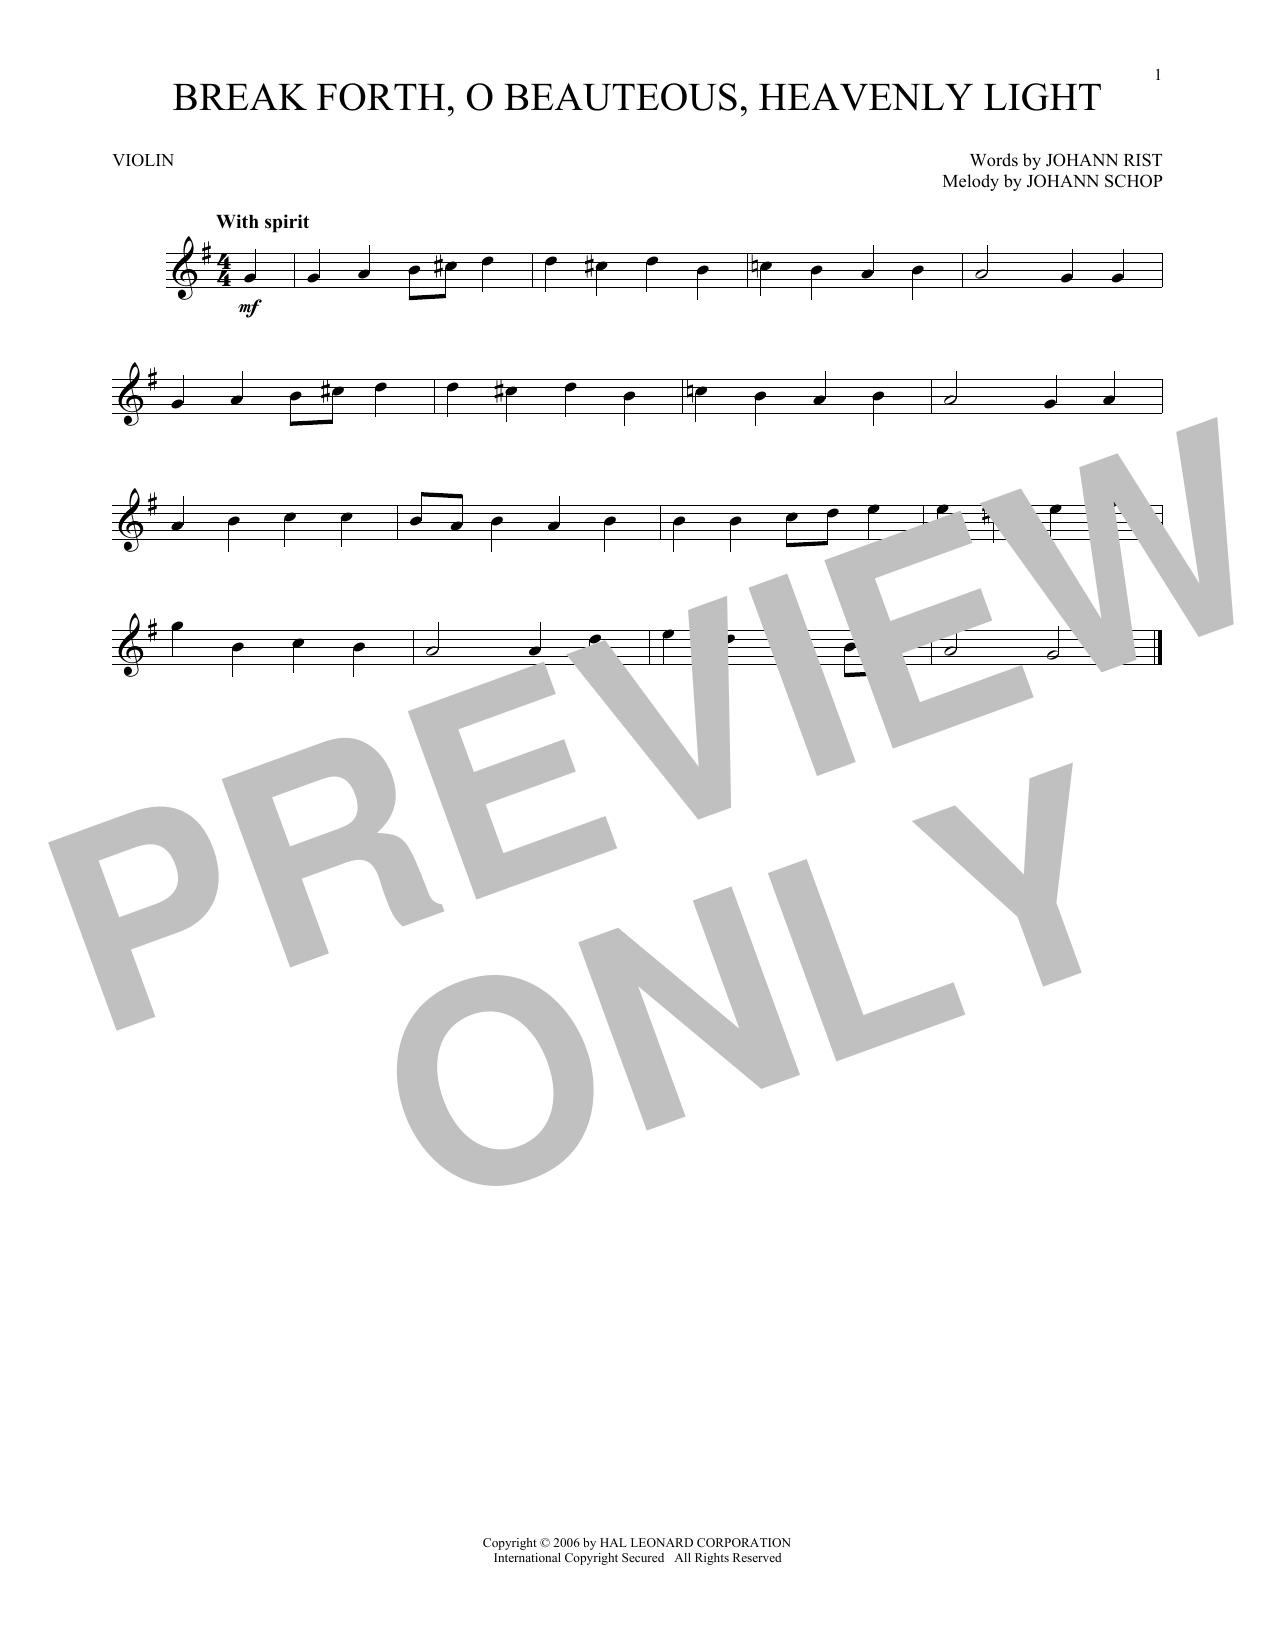 Break Forth, O Beauteous, Heavenly Light (Violin Solo)